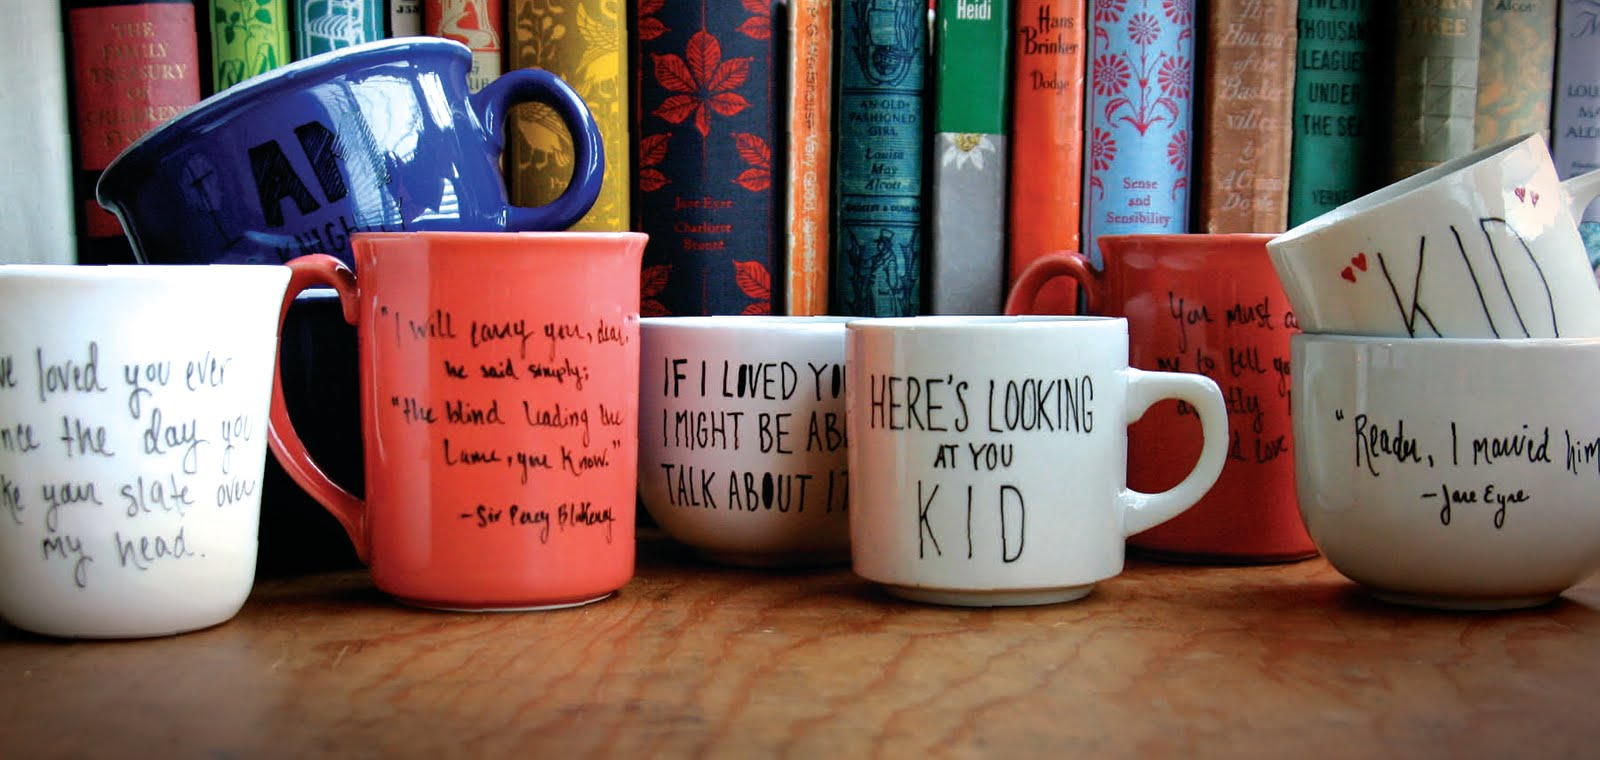 Mugs quote #1